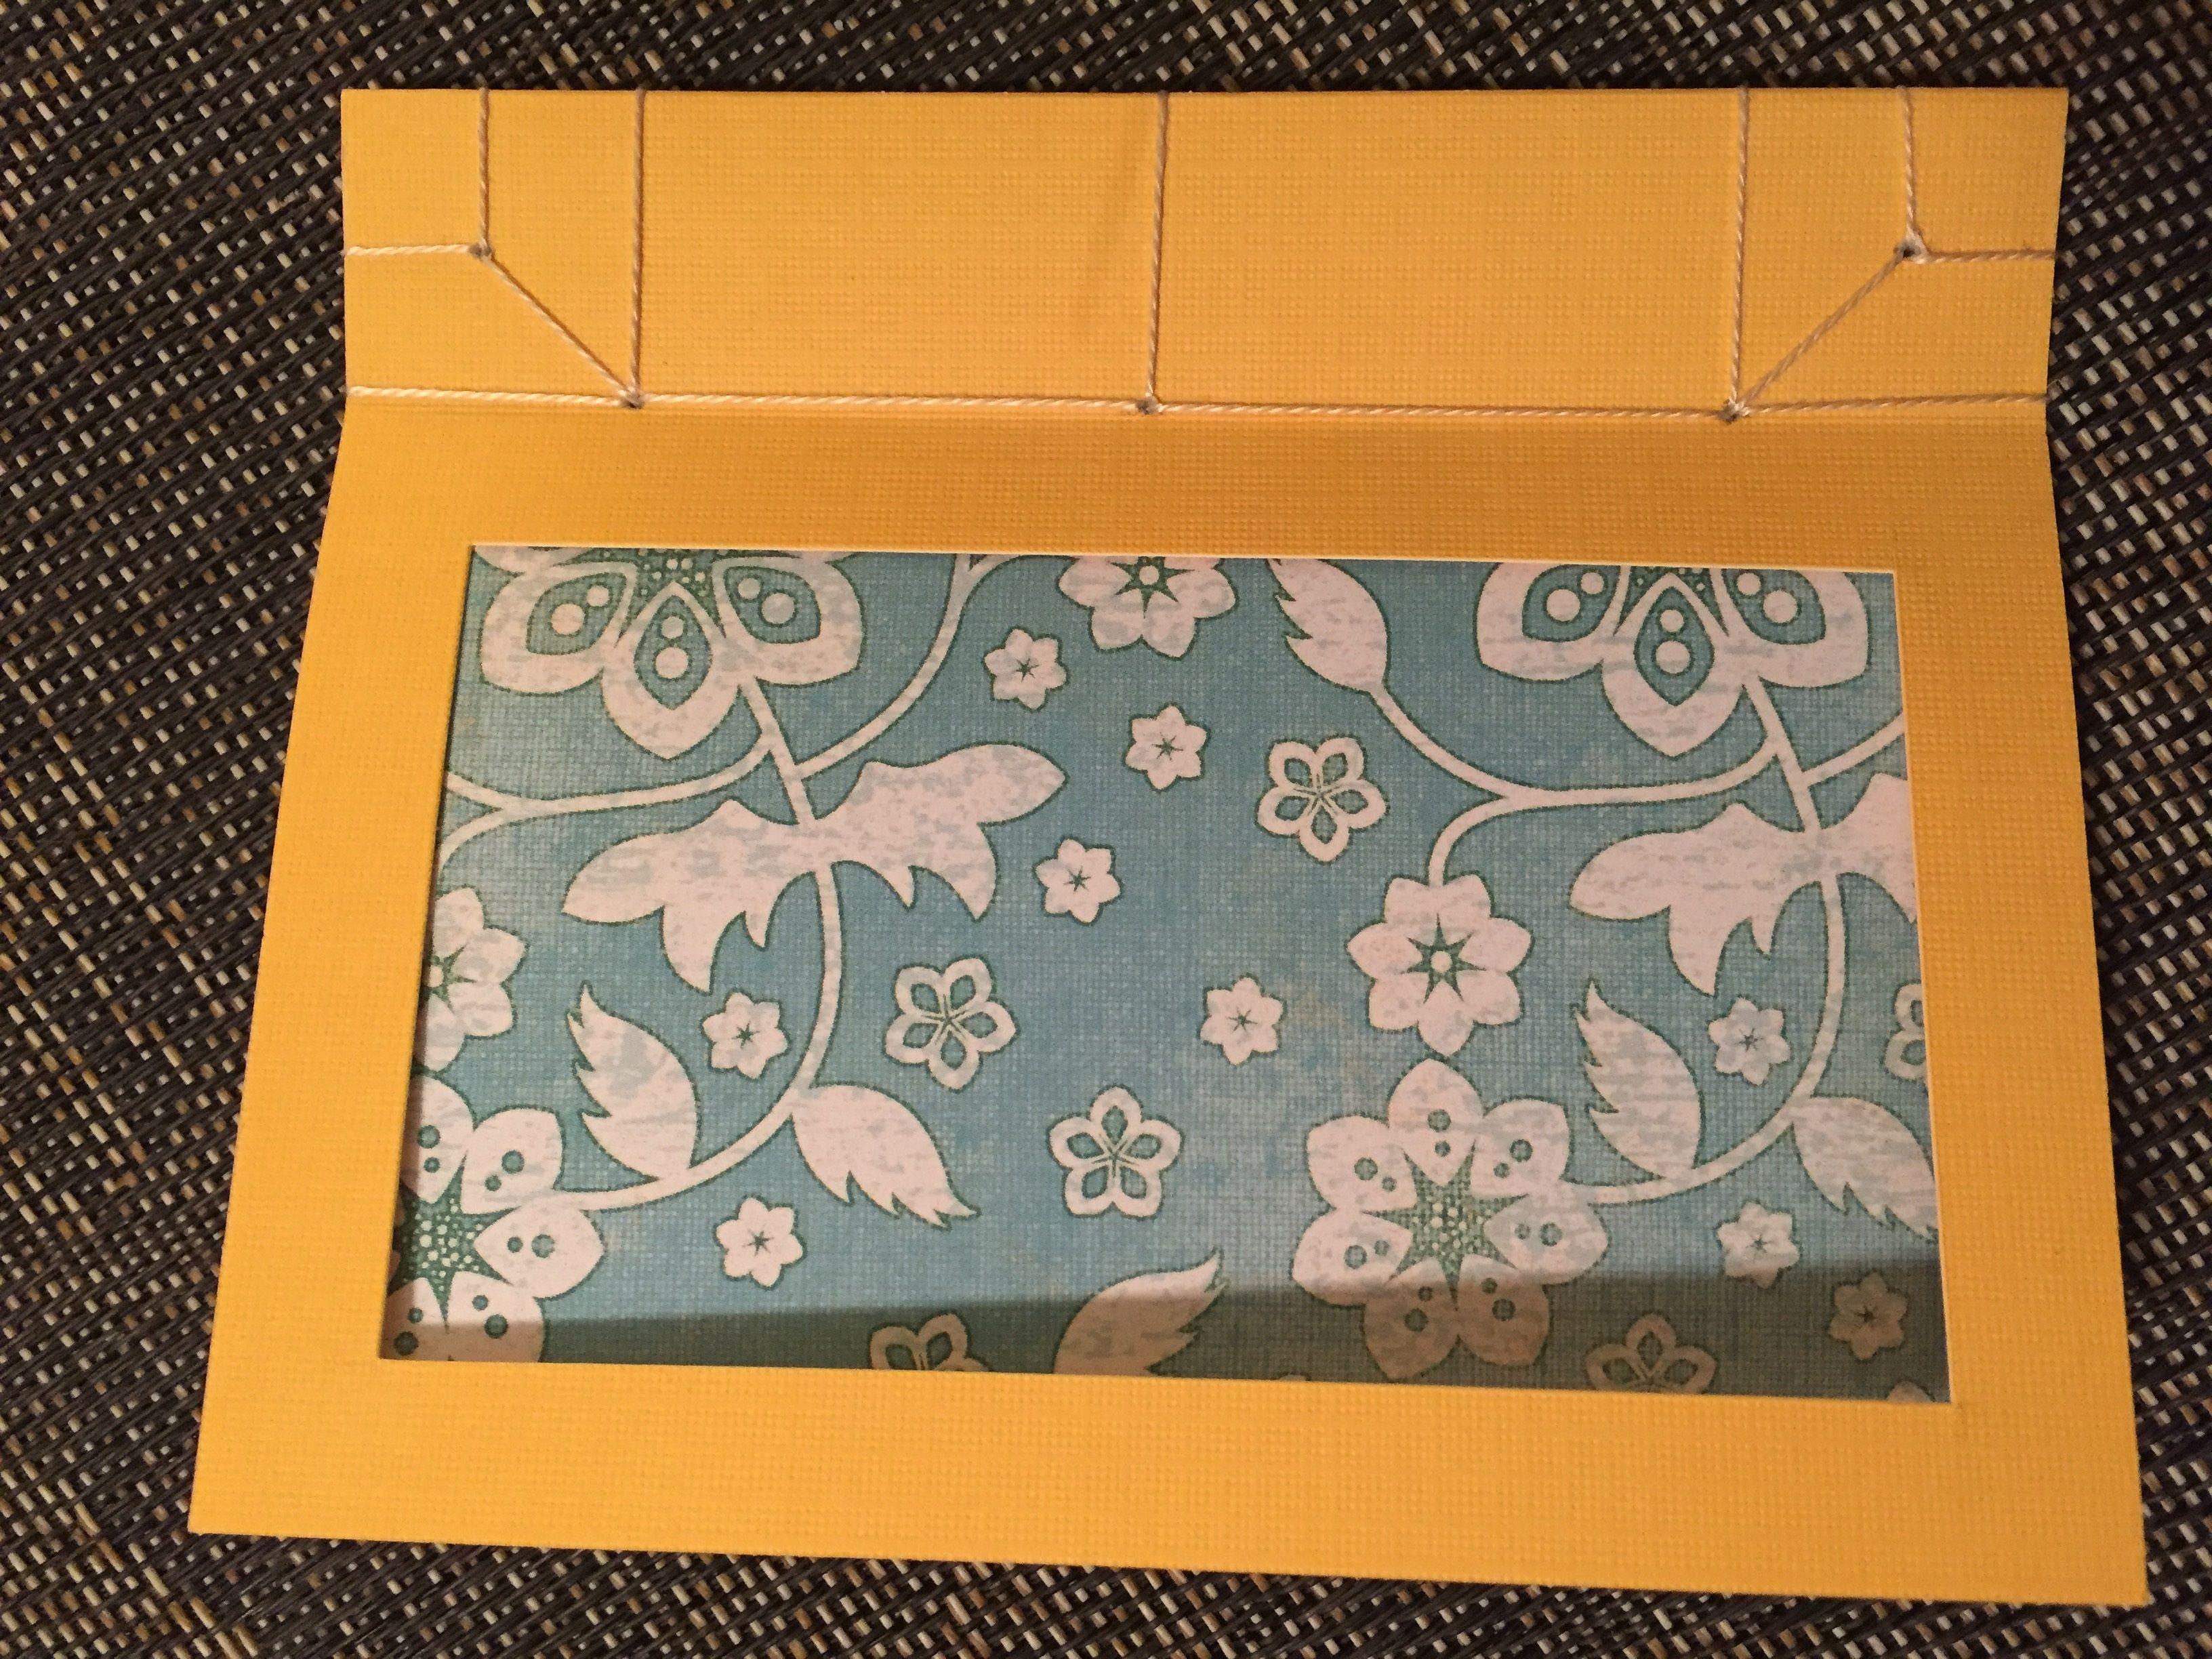 Handmade post card, Japanese Binding method